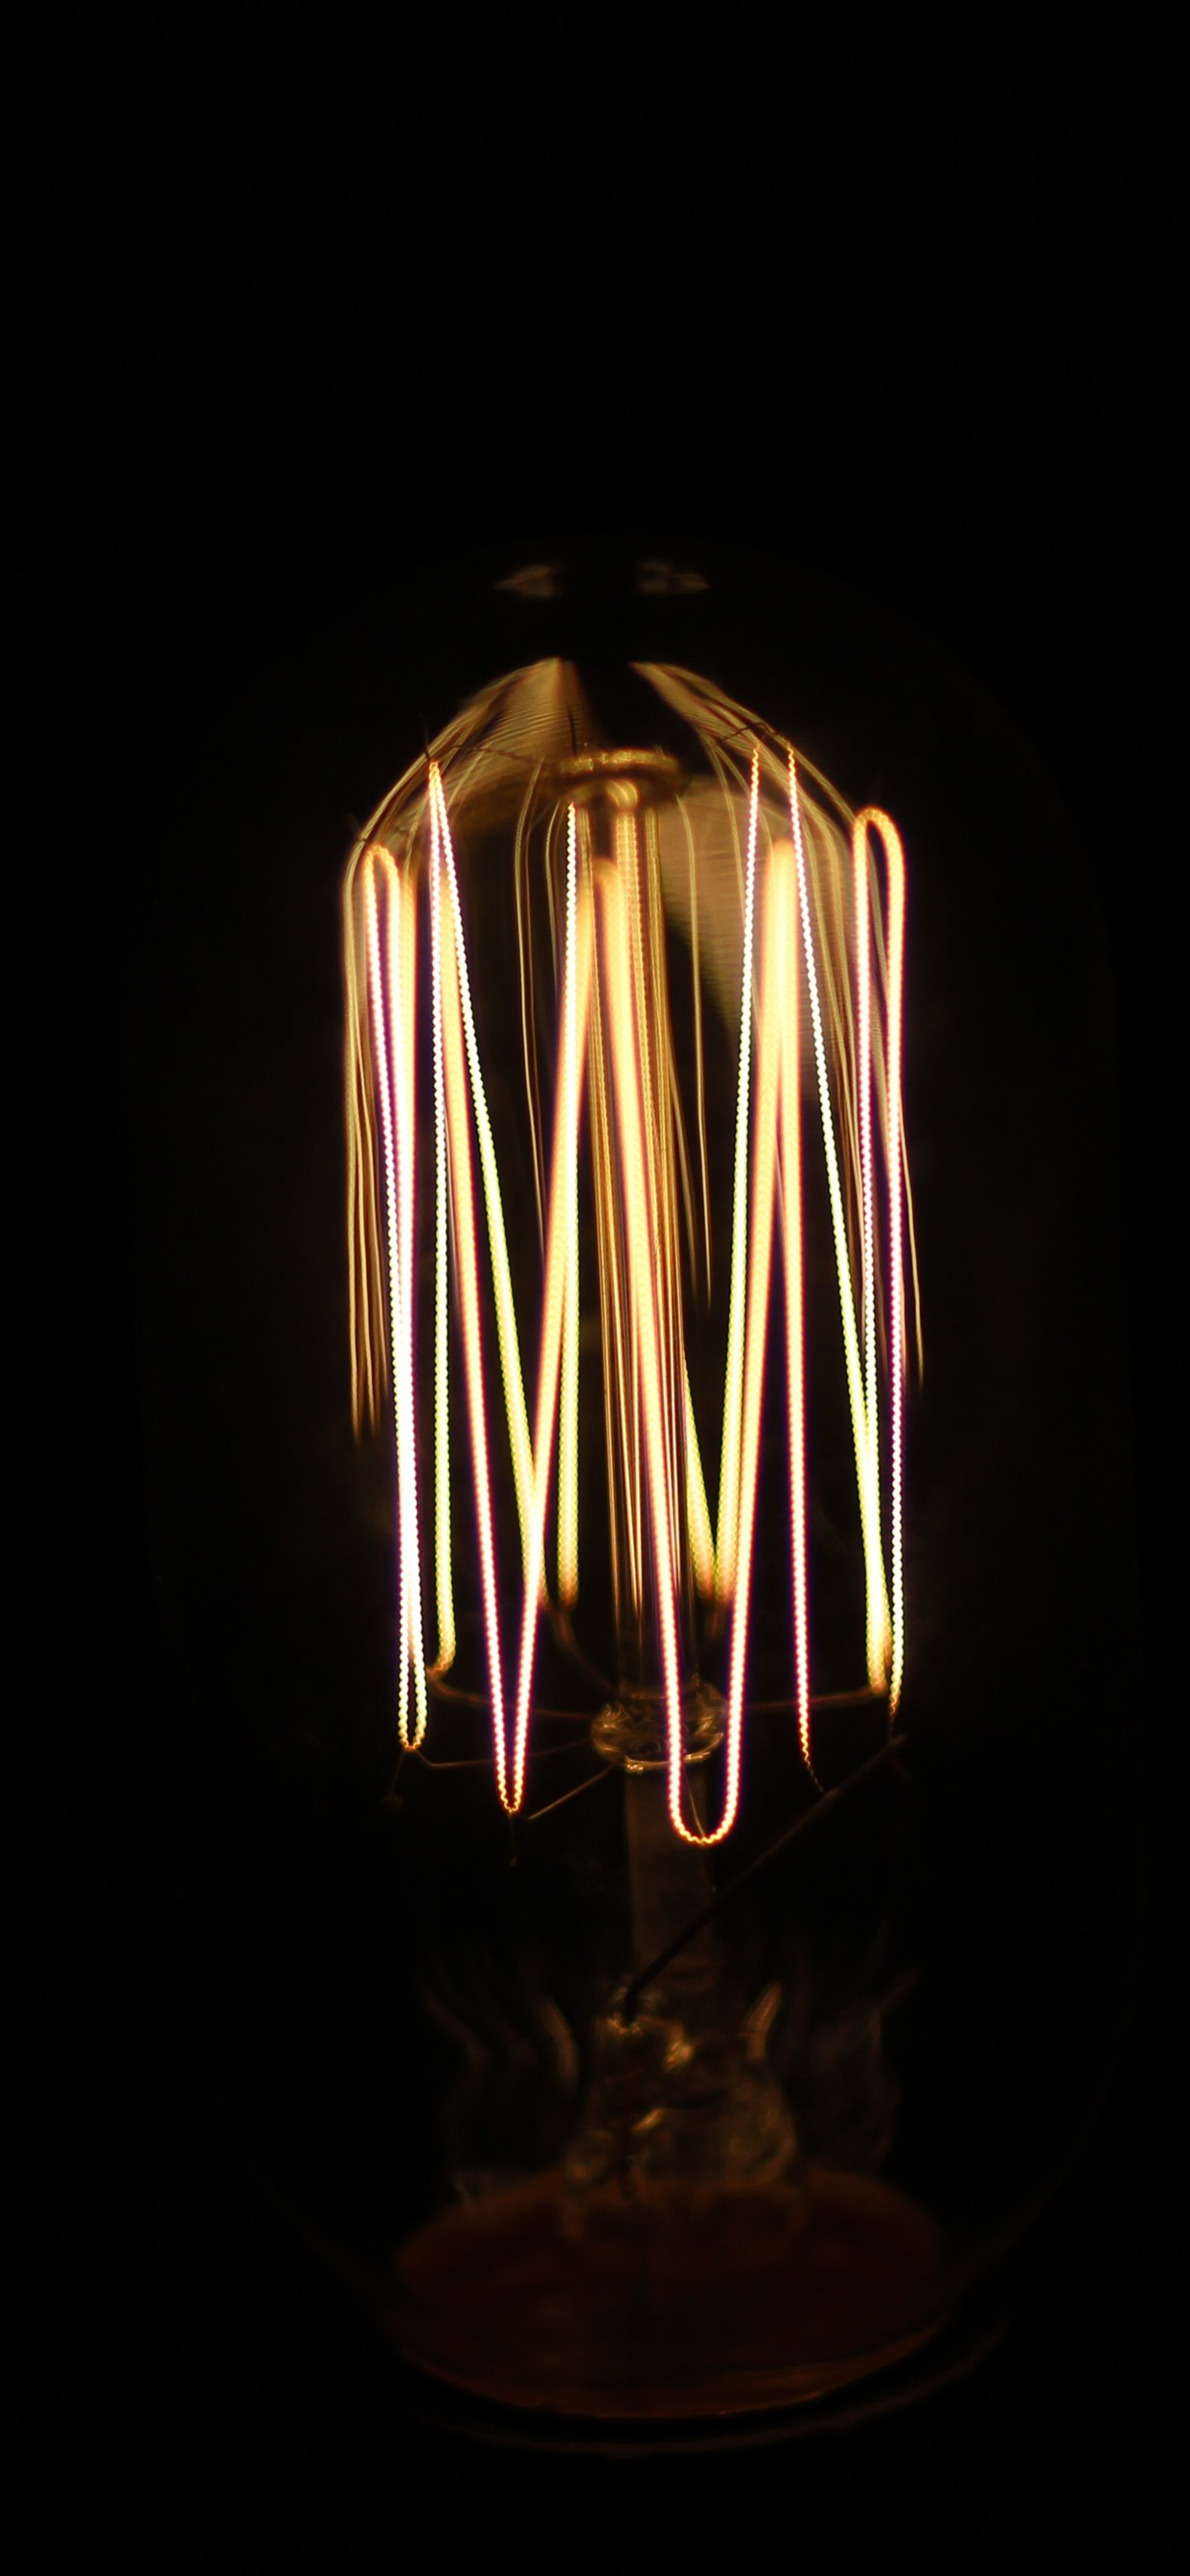 Wallpaper Lamp Light Bulb Darkness 5120x2880 Uhd 5k